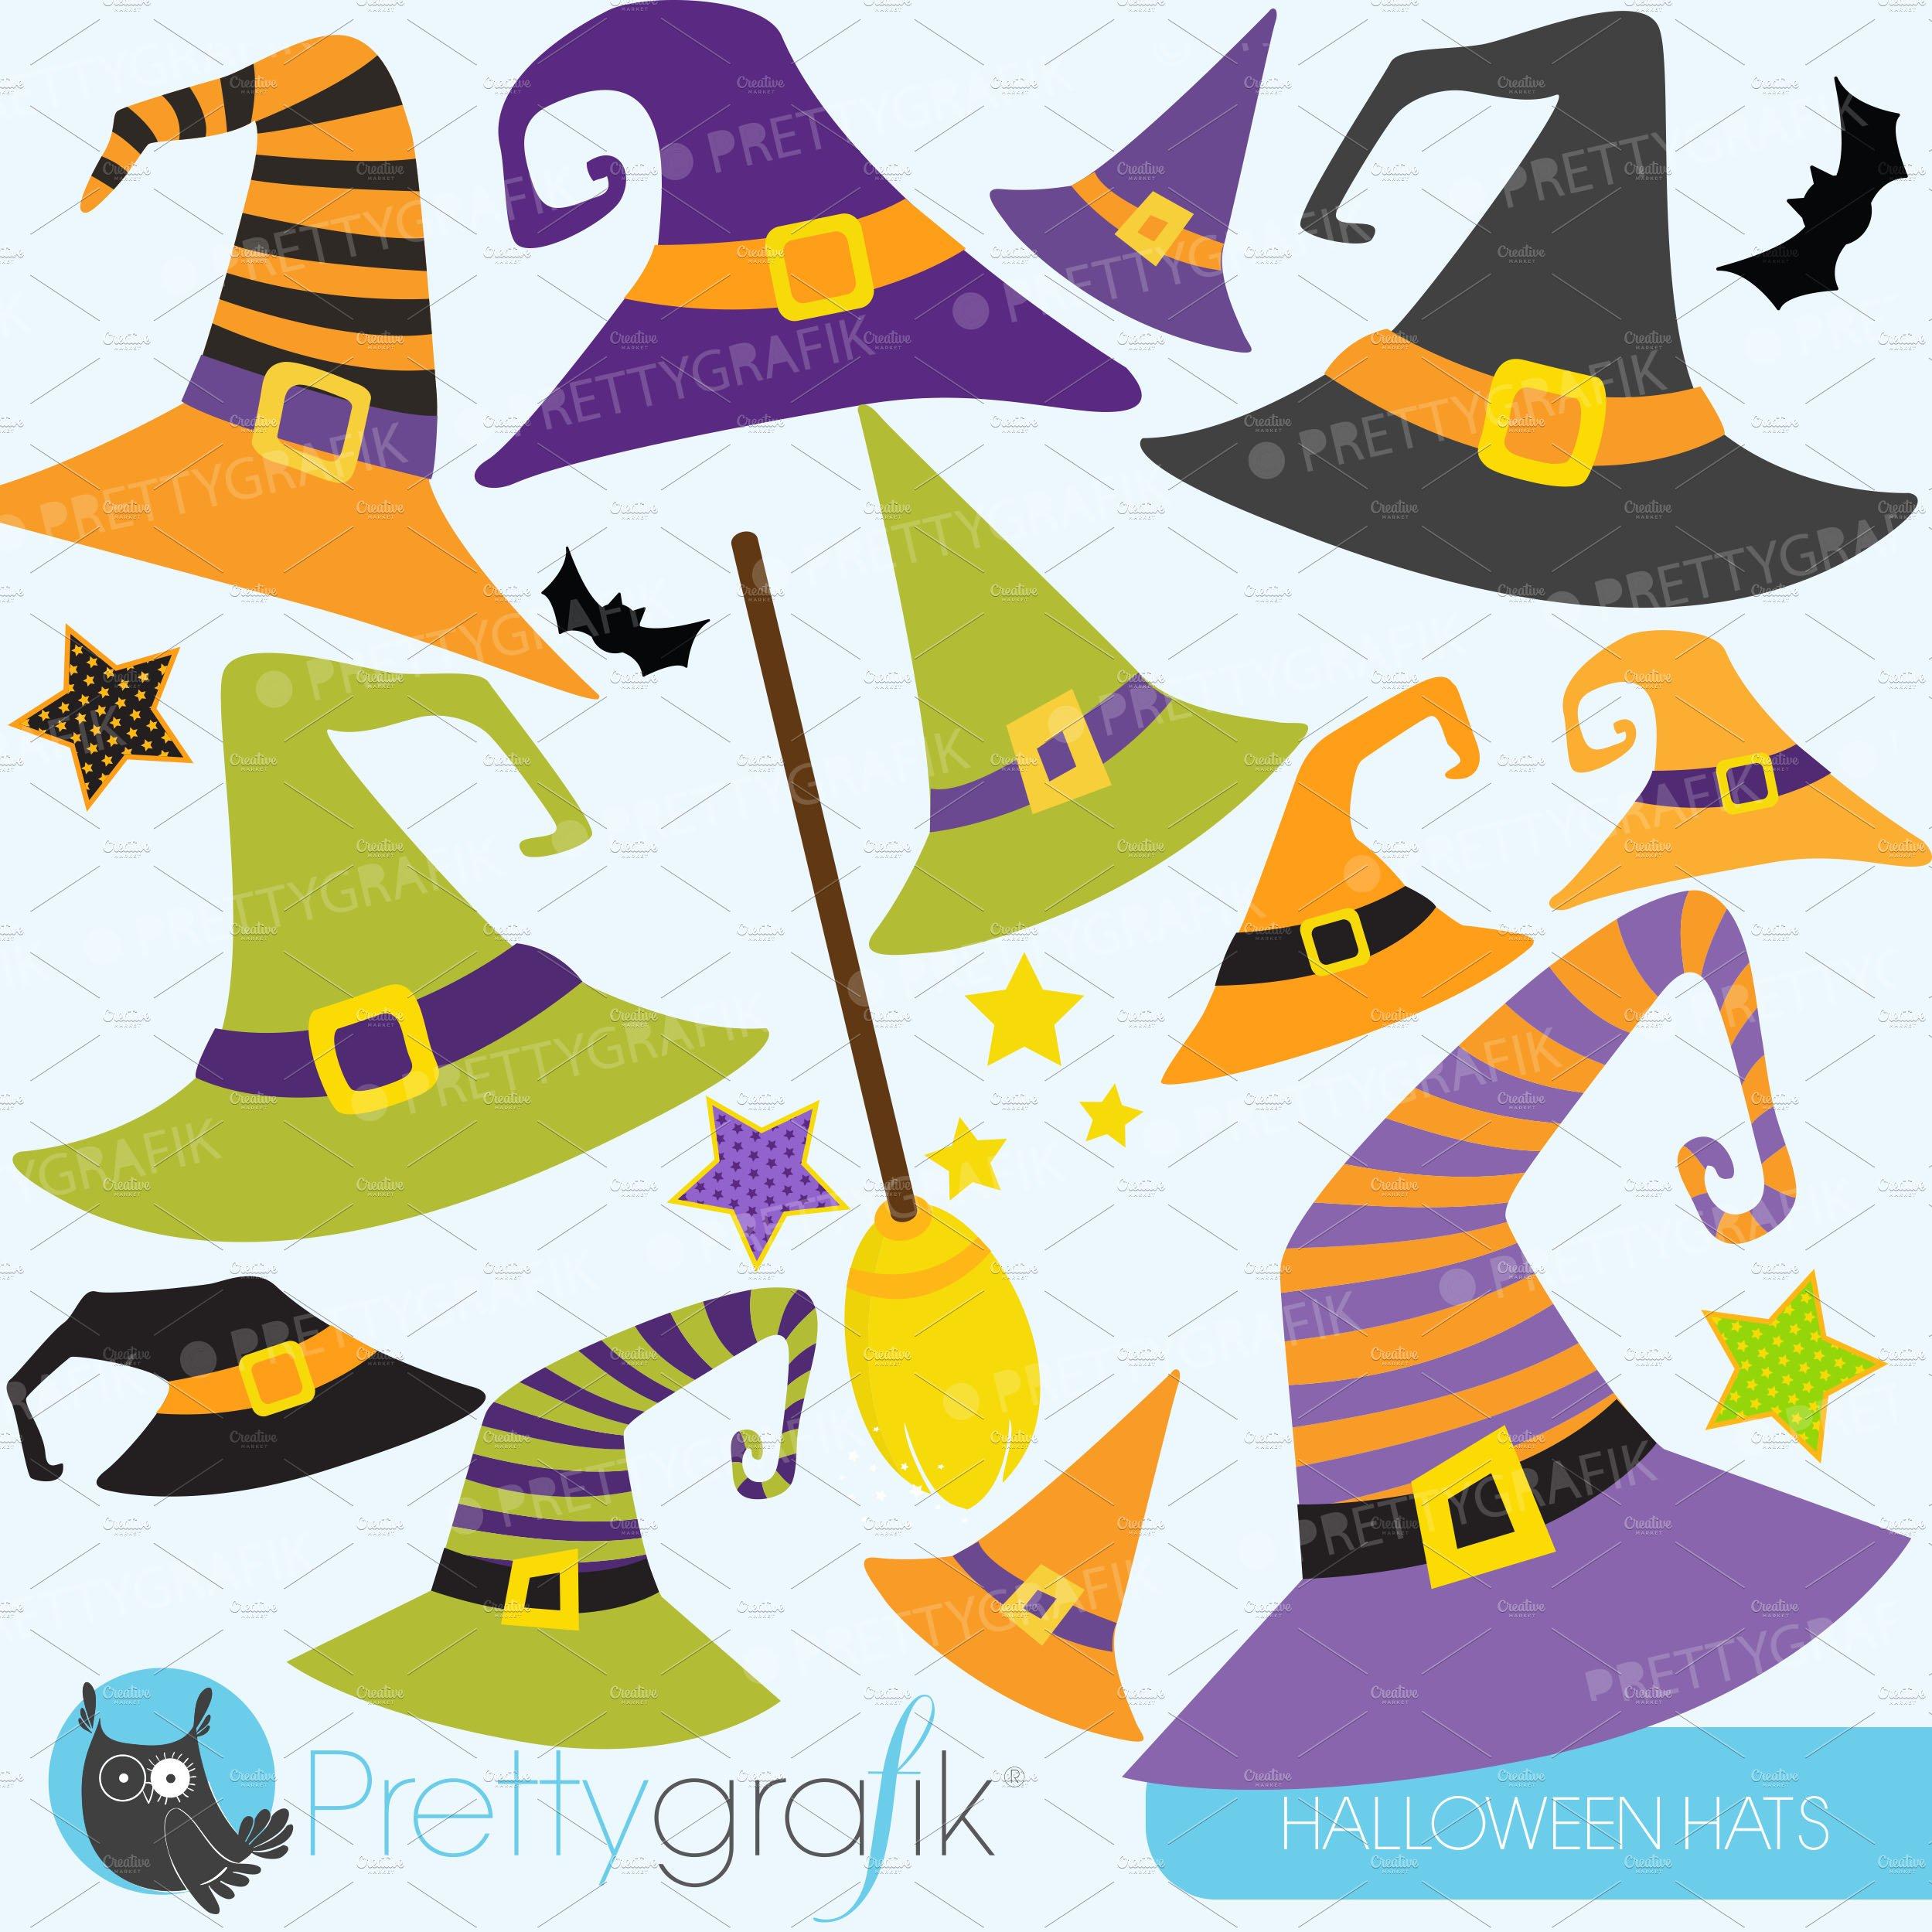 Halloween Hats Clipart Commercial Pre Designed Illustrator Graphics Creative Market